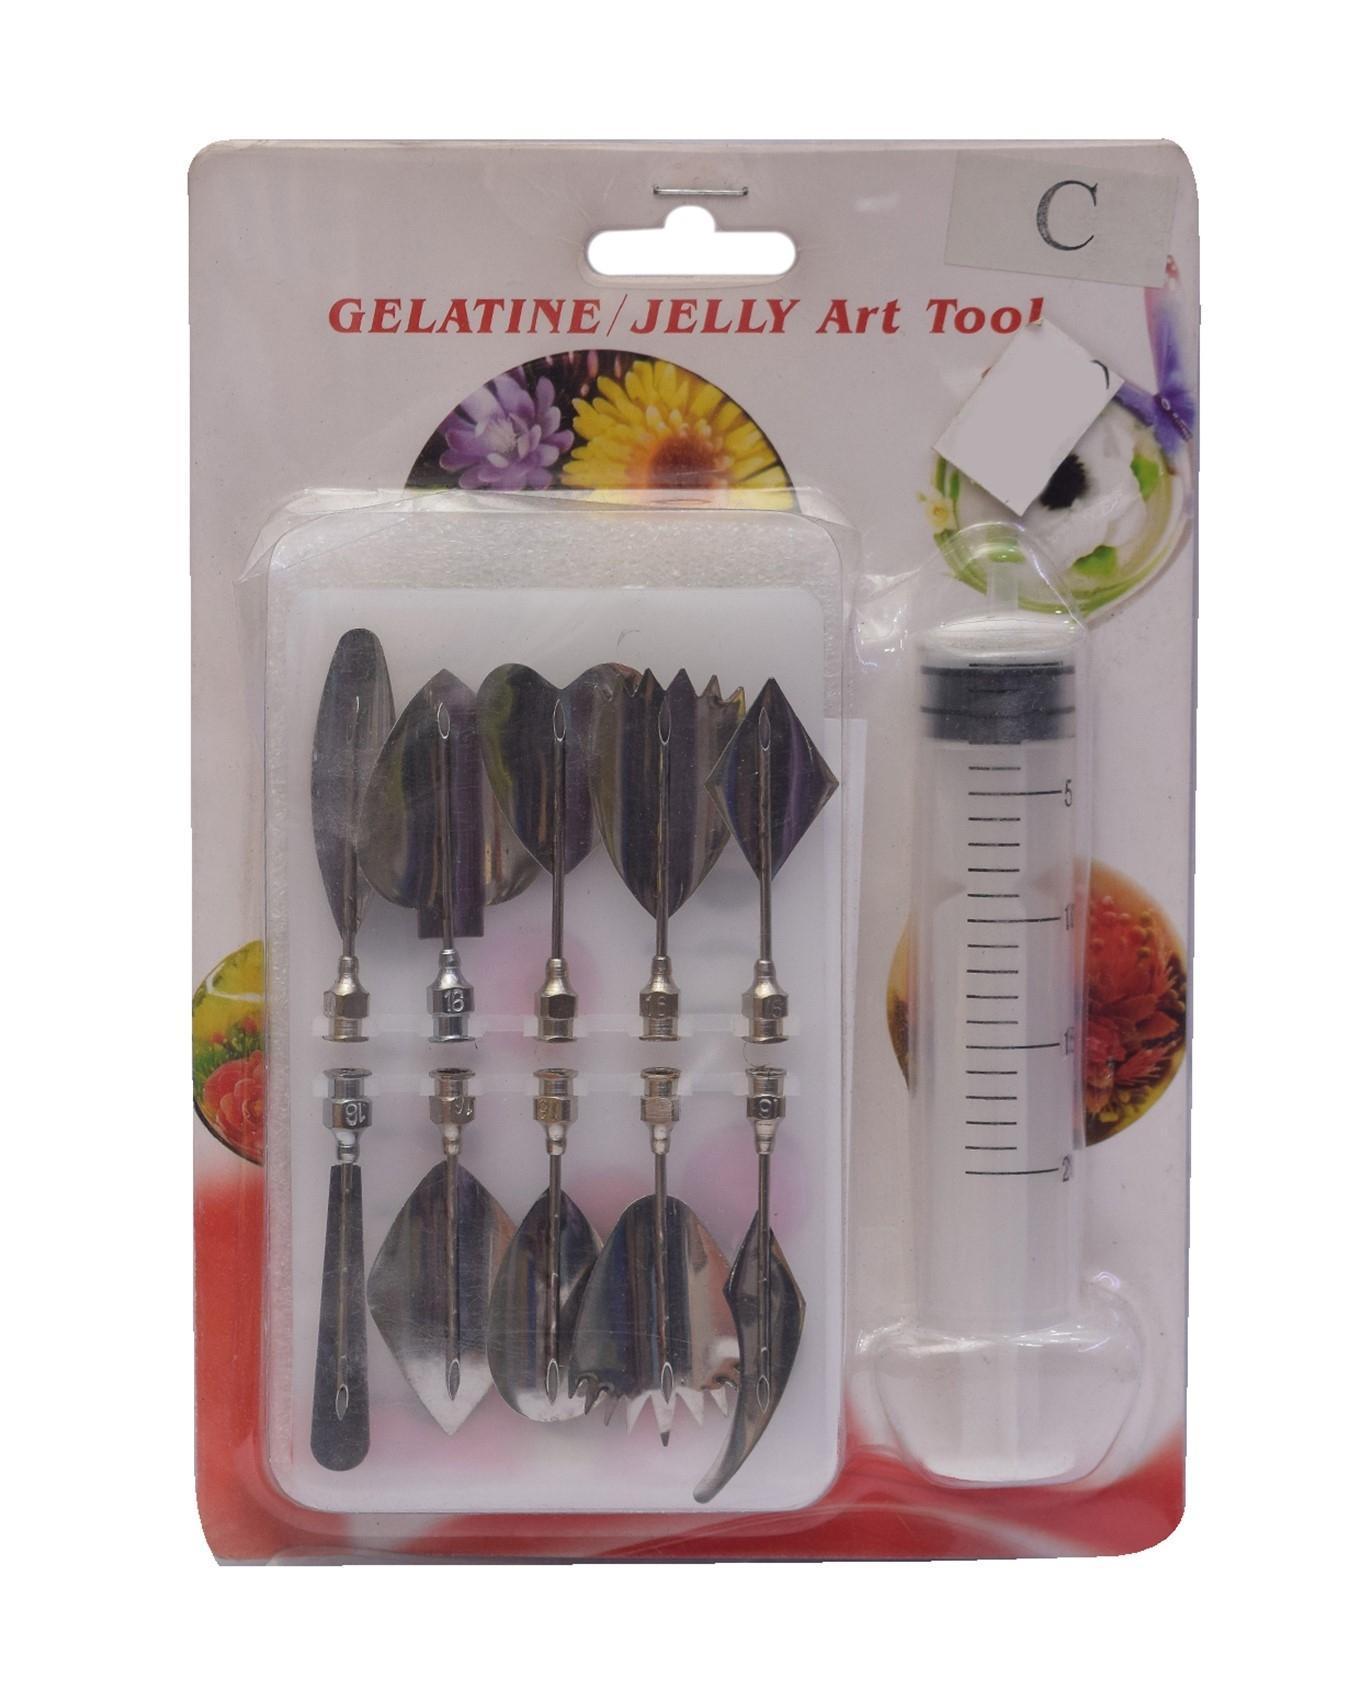 Galantine Jelly Art Tool